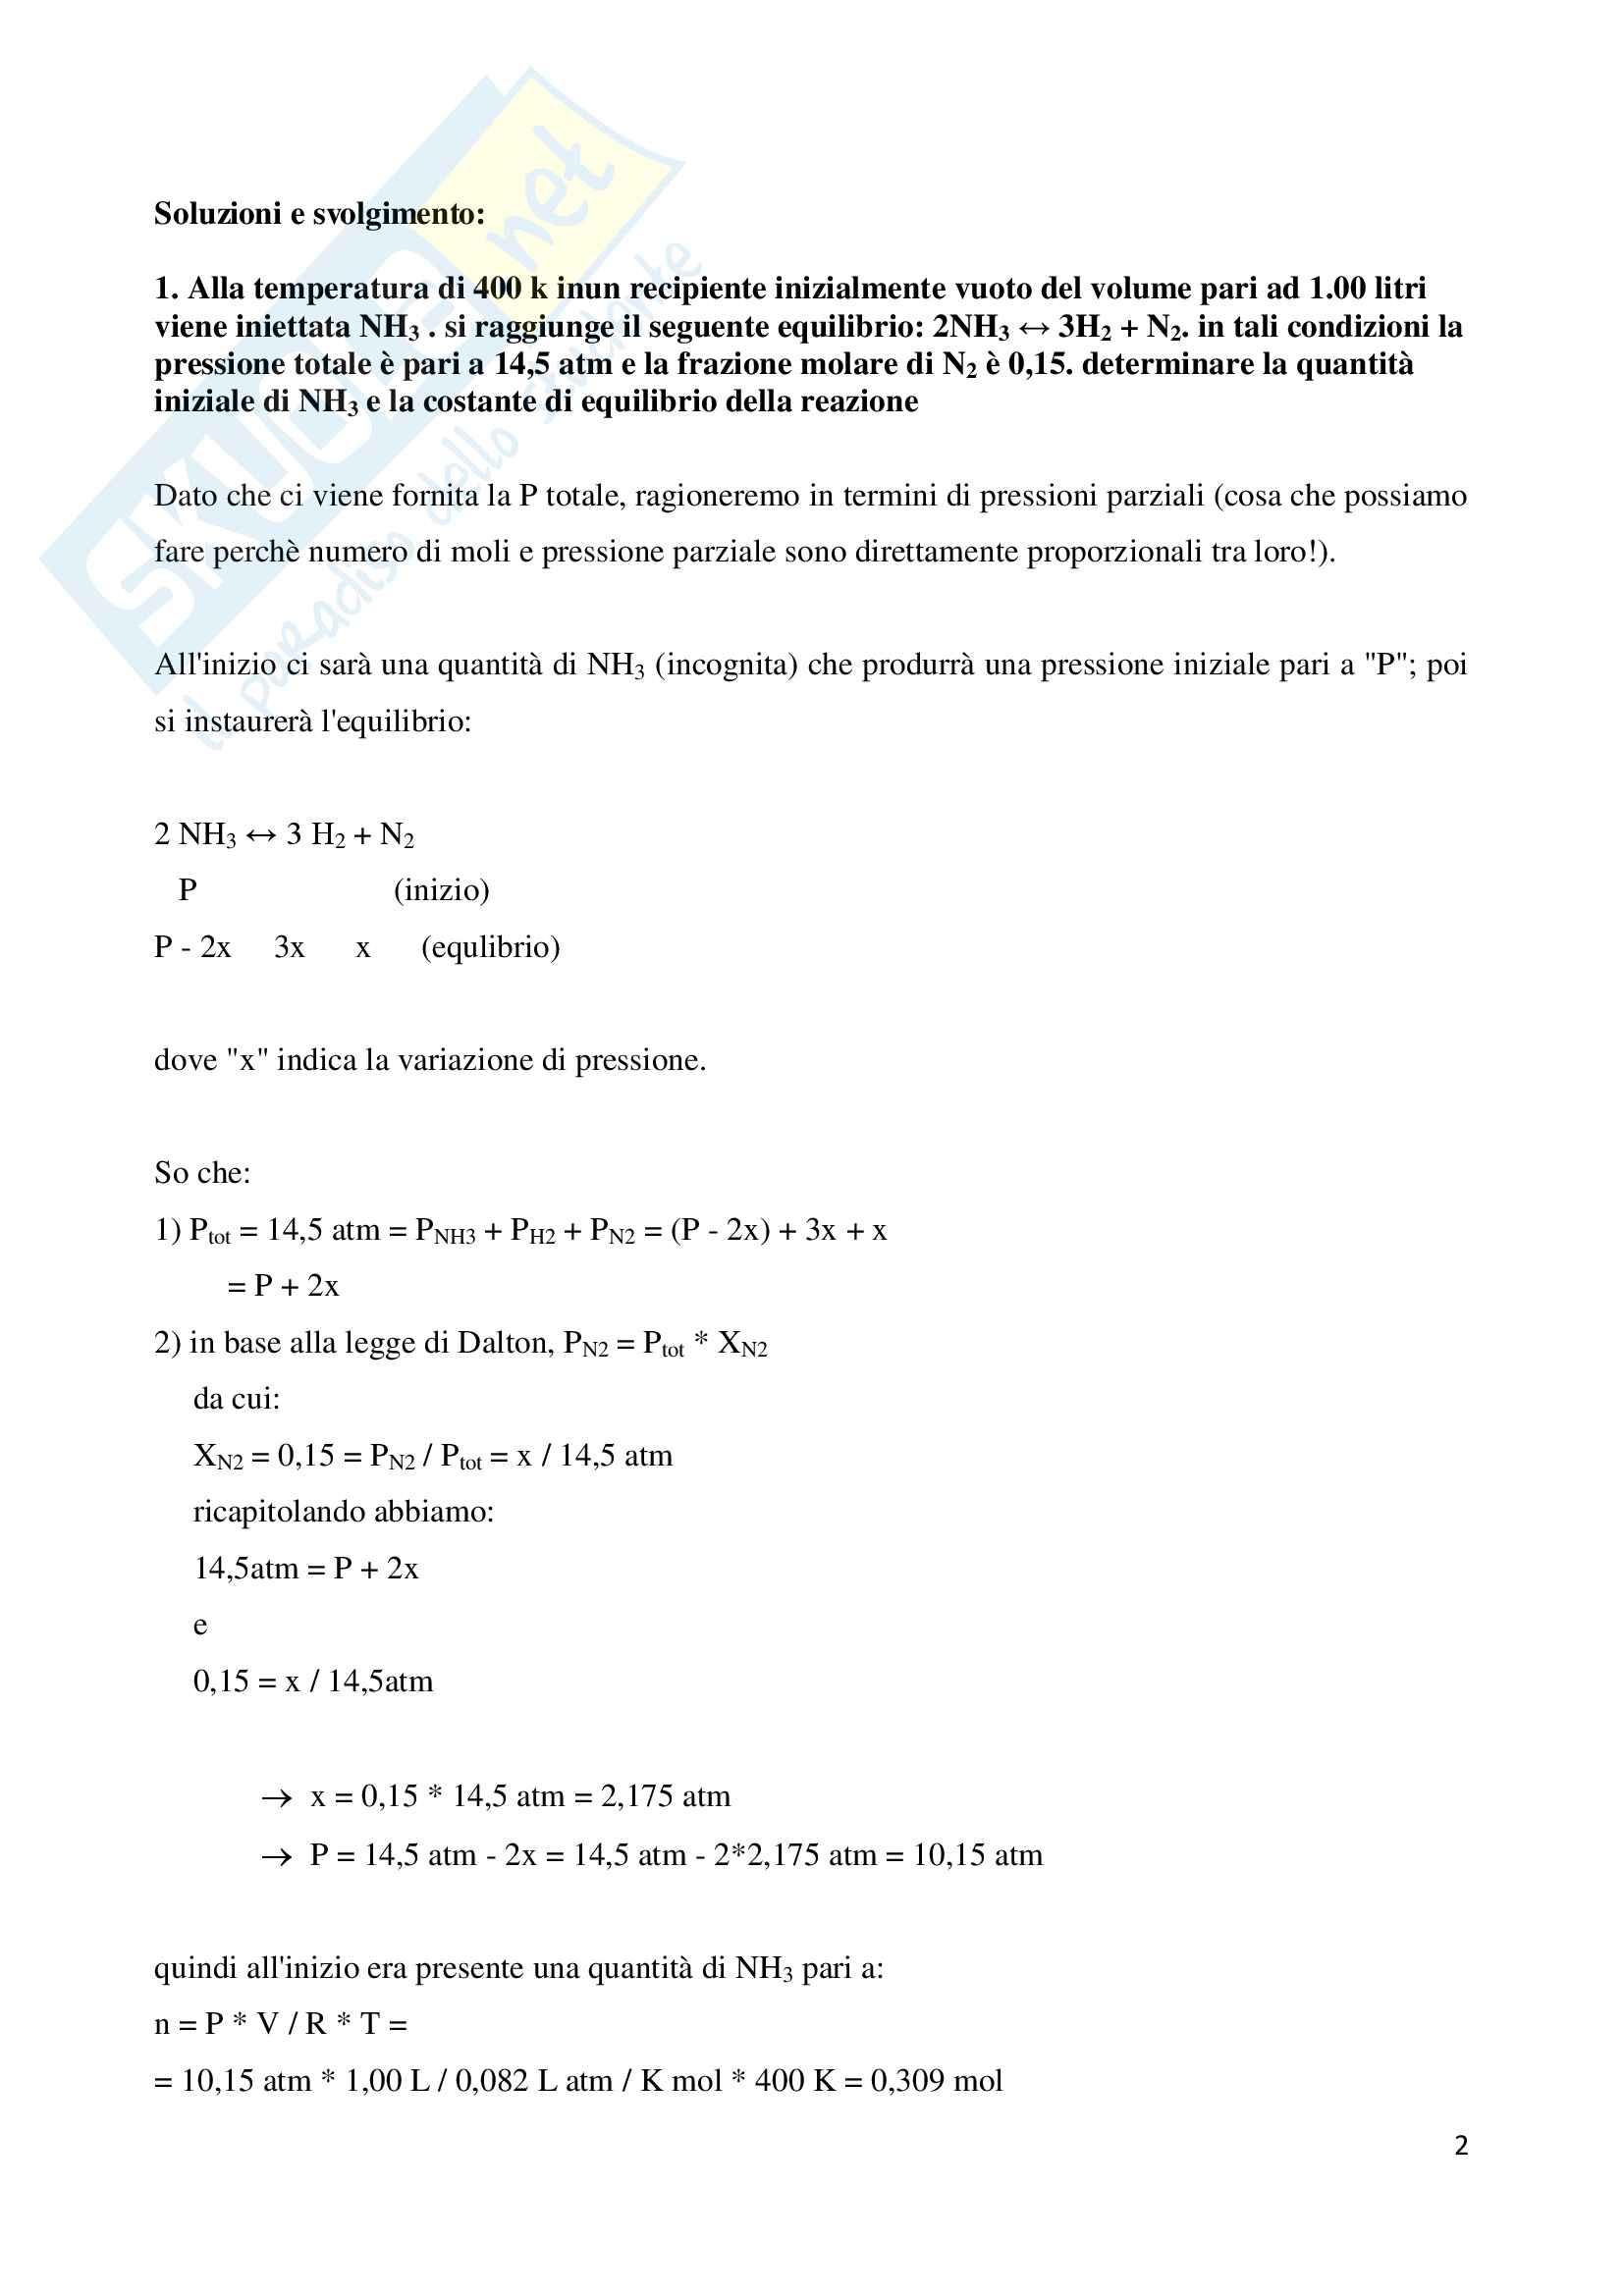 Esercizi sugli equilibri in fase gassosa Pag. 2